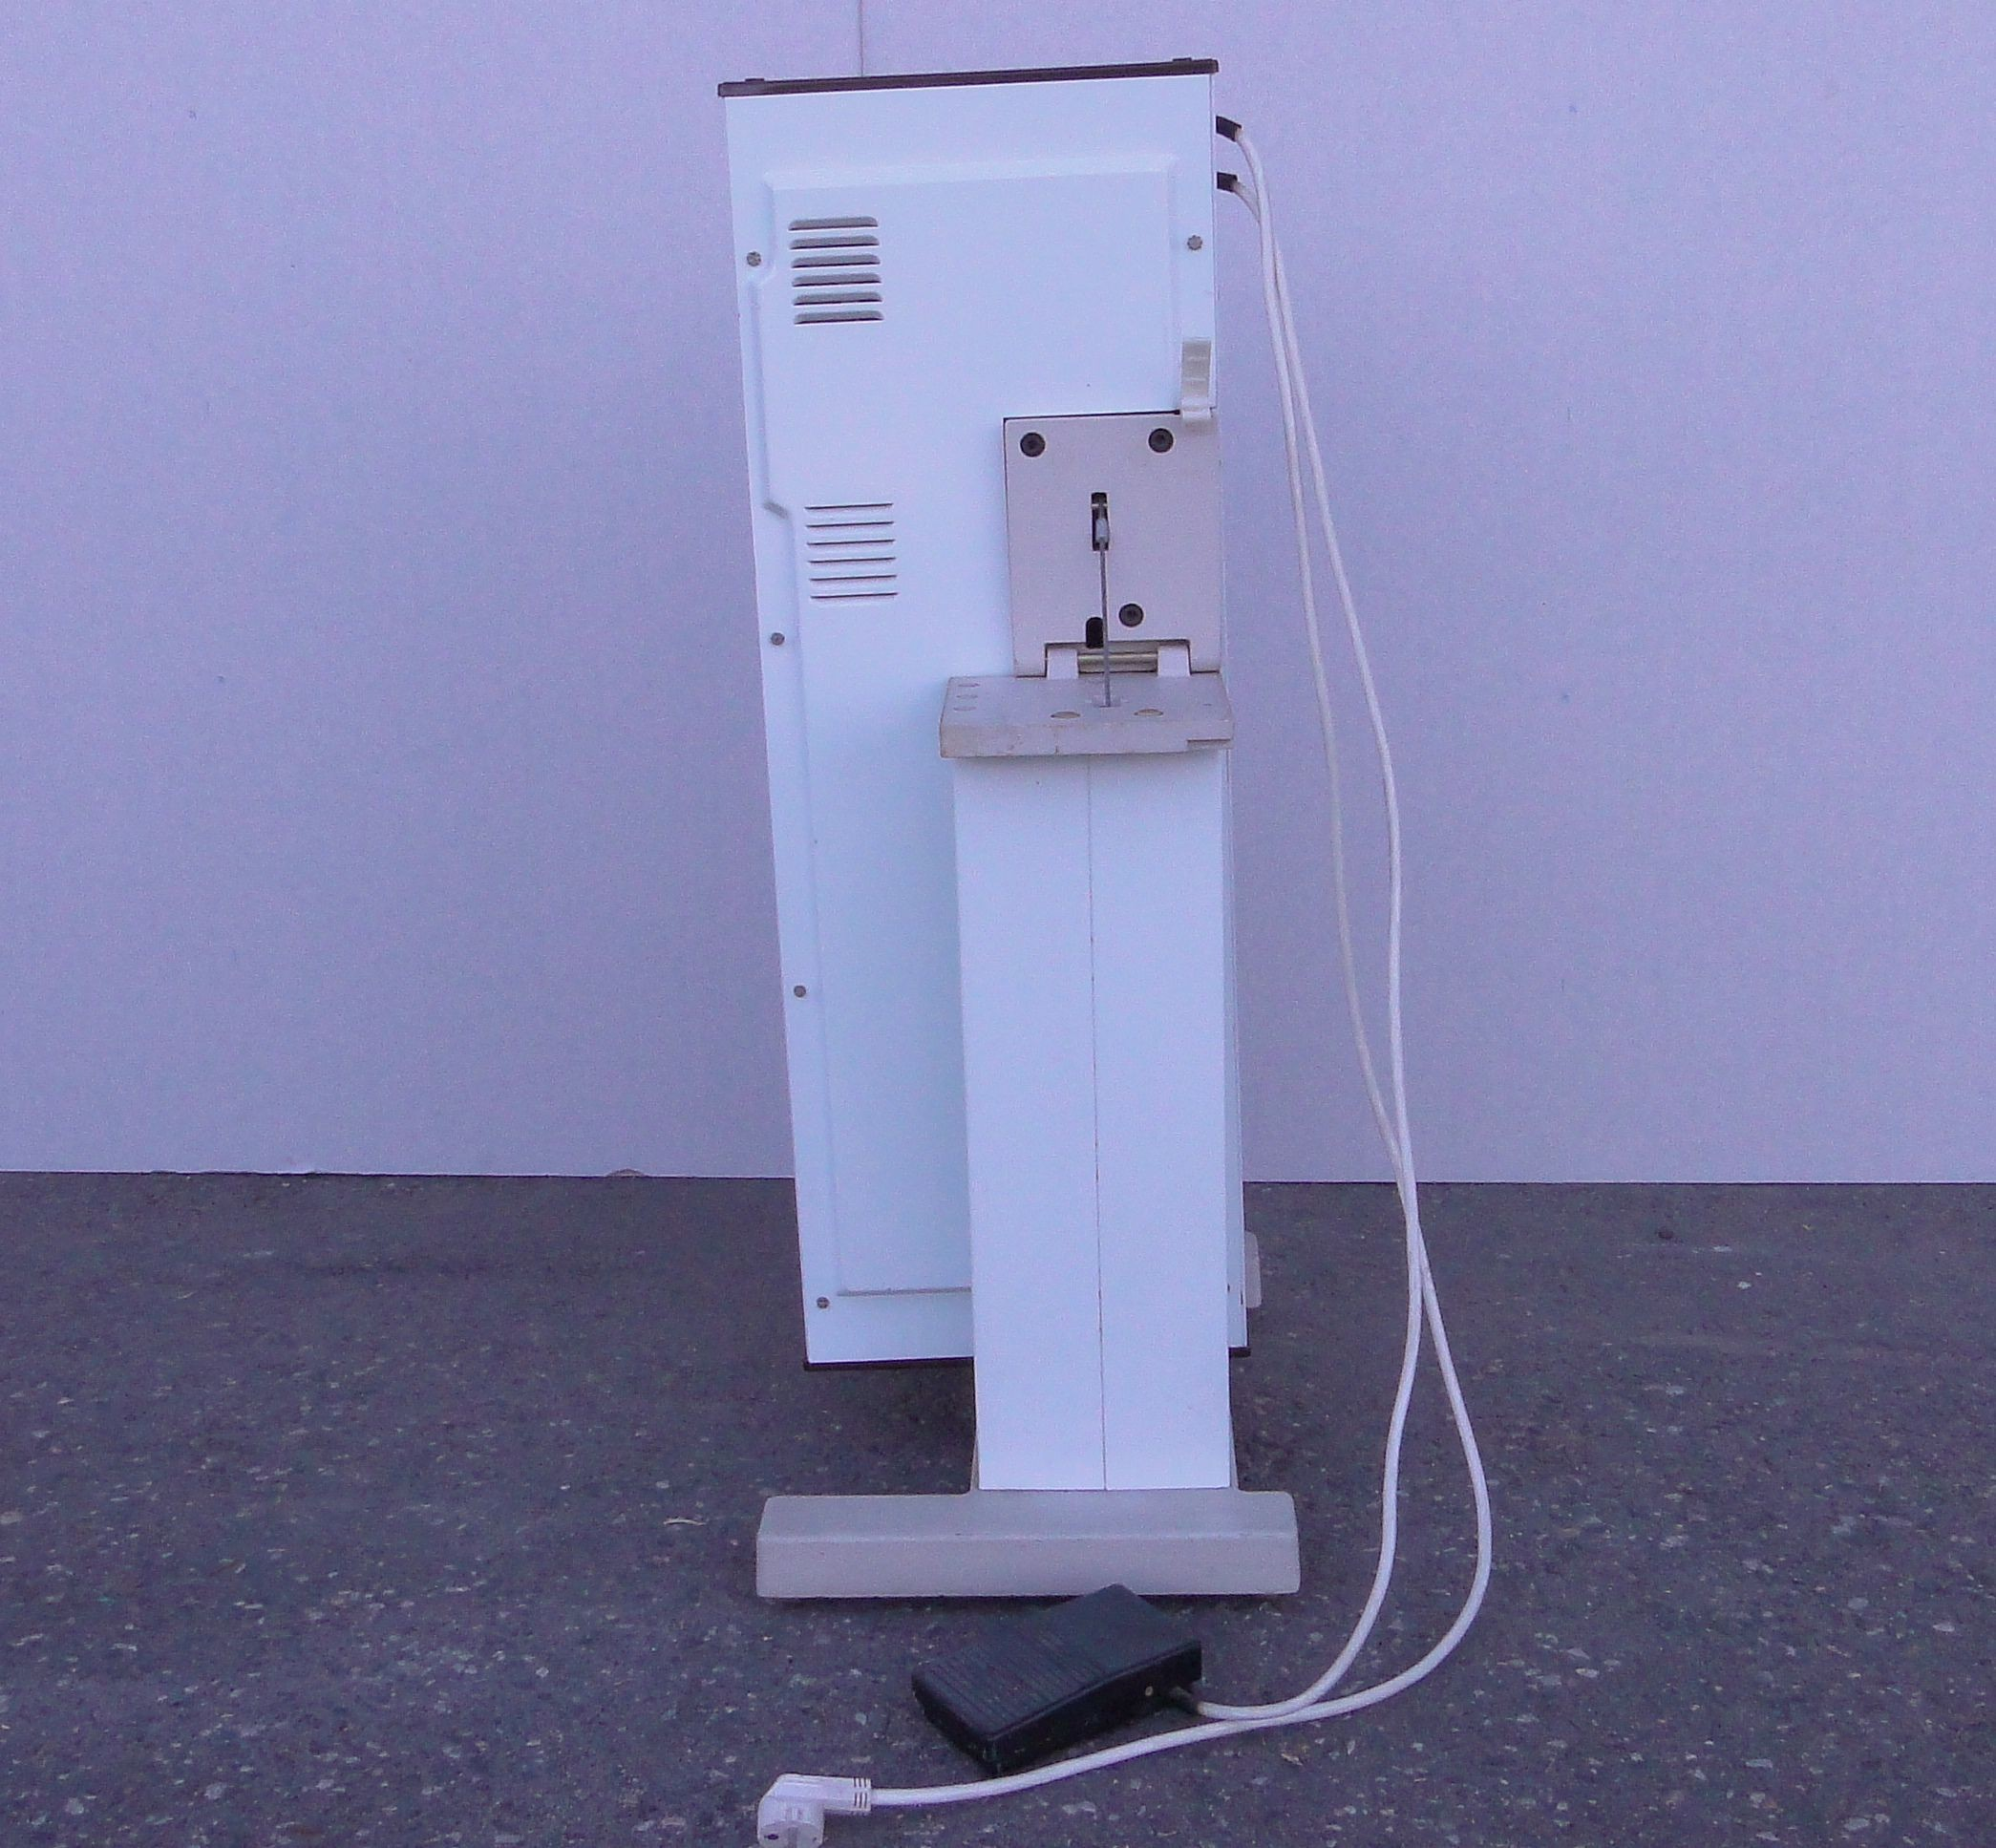 DSC09786.JPG (2090×1935)